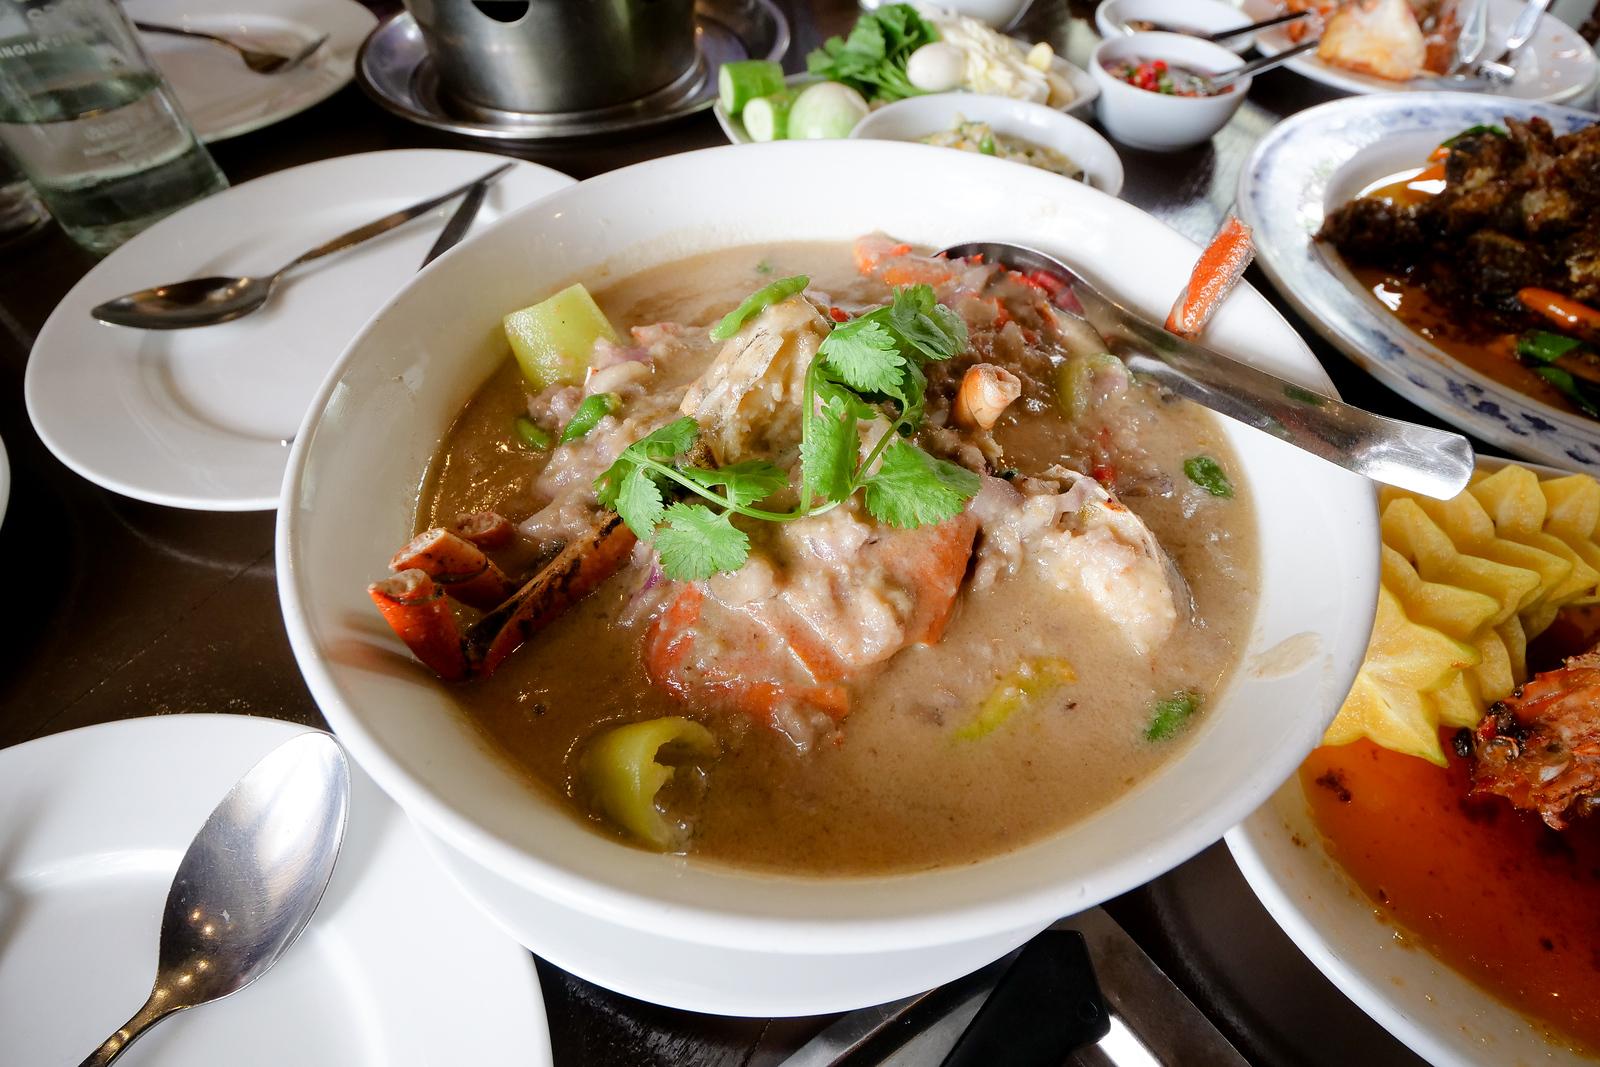 Crab relish (หลนปูเนื้อ)